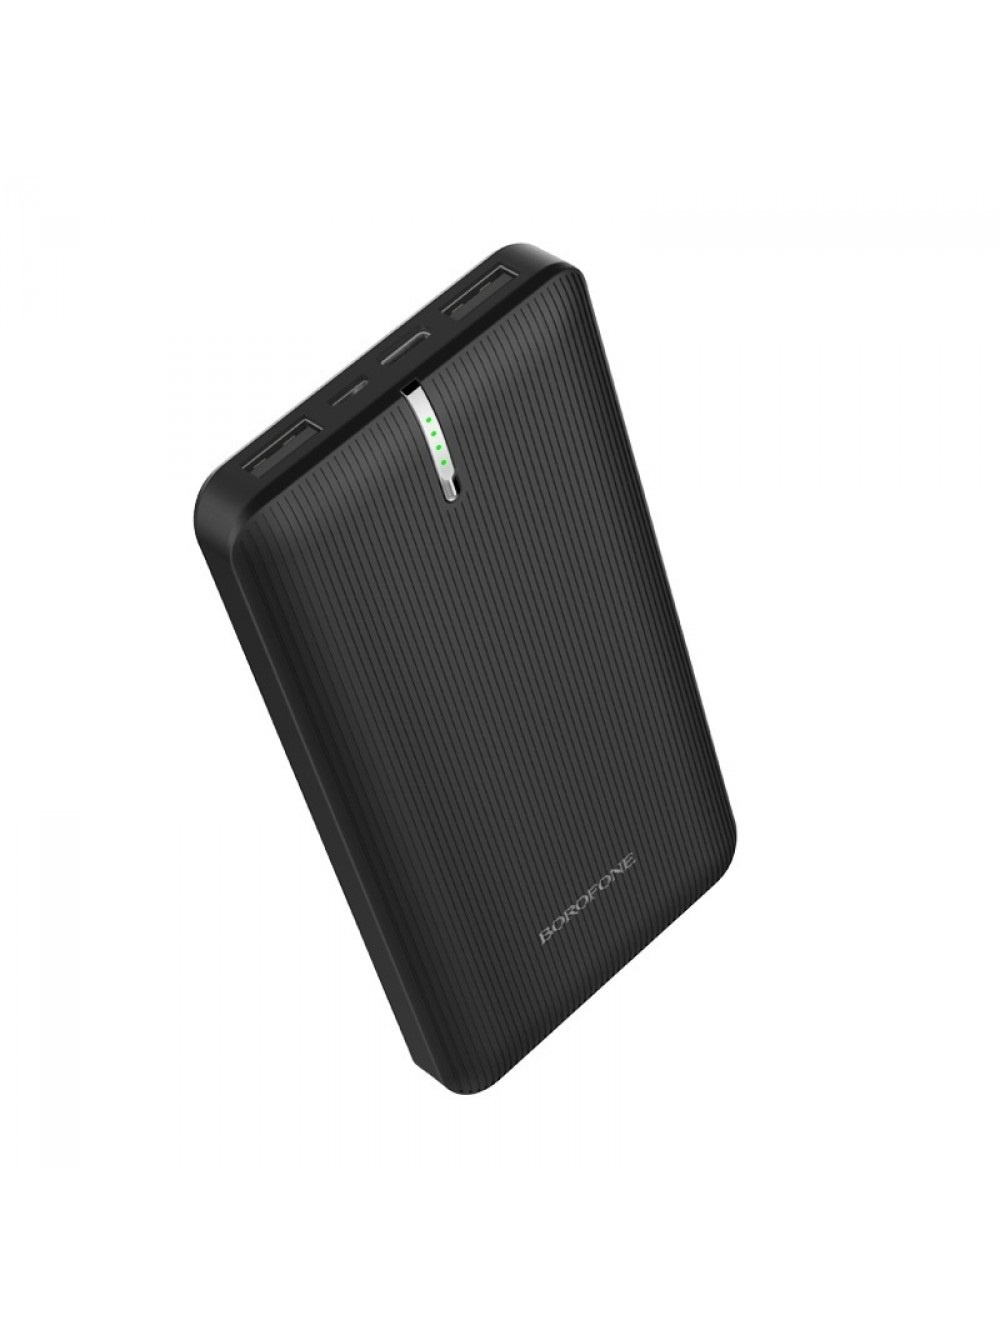 лучшая цена Внешний аккумулятор Borofone BT18A Prosperous mobile power bank 13000mAh Black